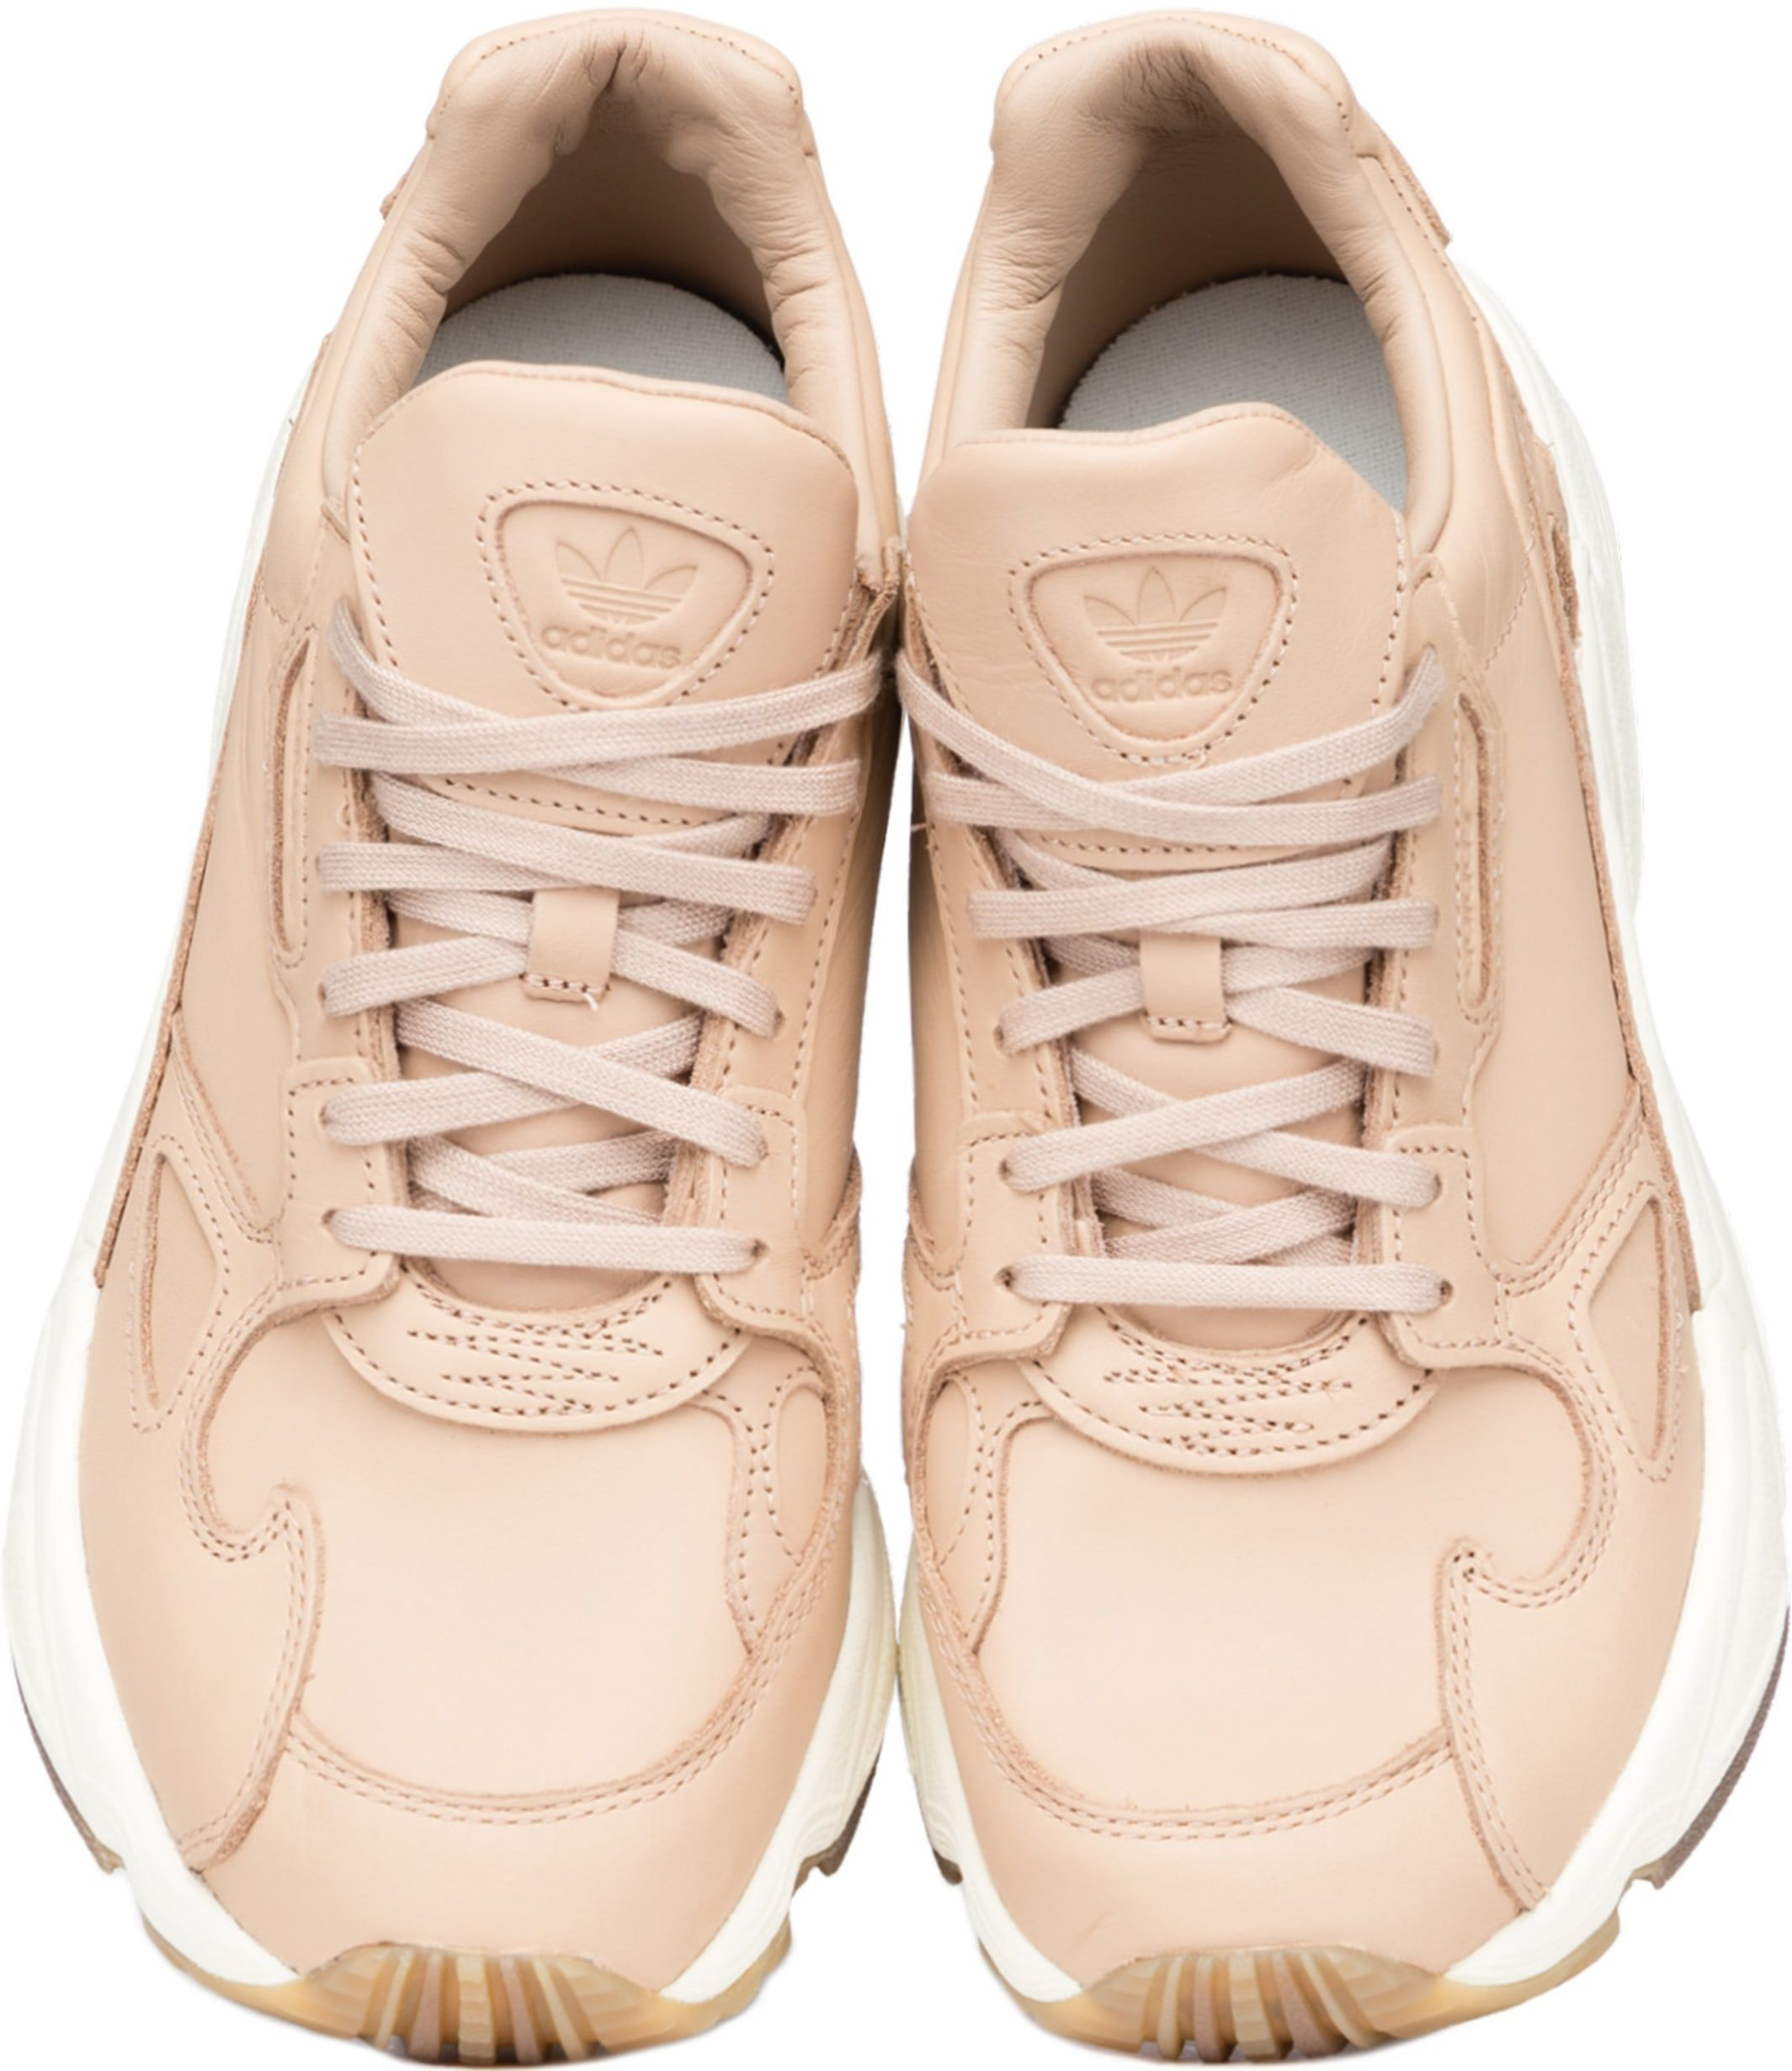 ce7877ea922bef adidas Originals: Falcon - Ash Pearl/Ash Pearl/Off White | Influence U